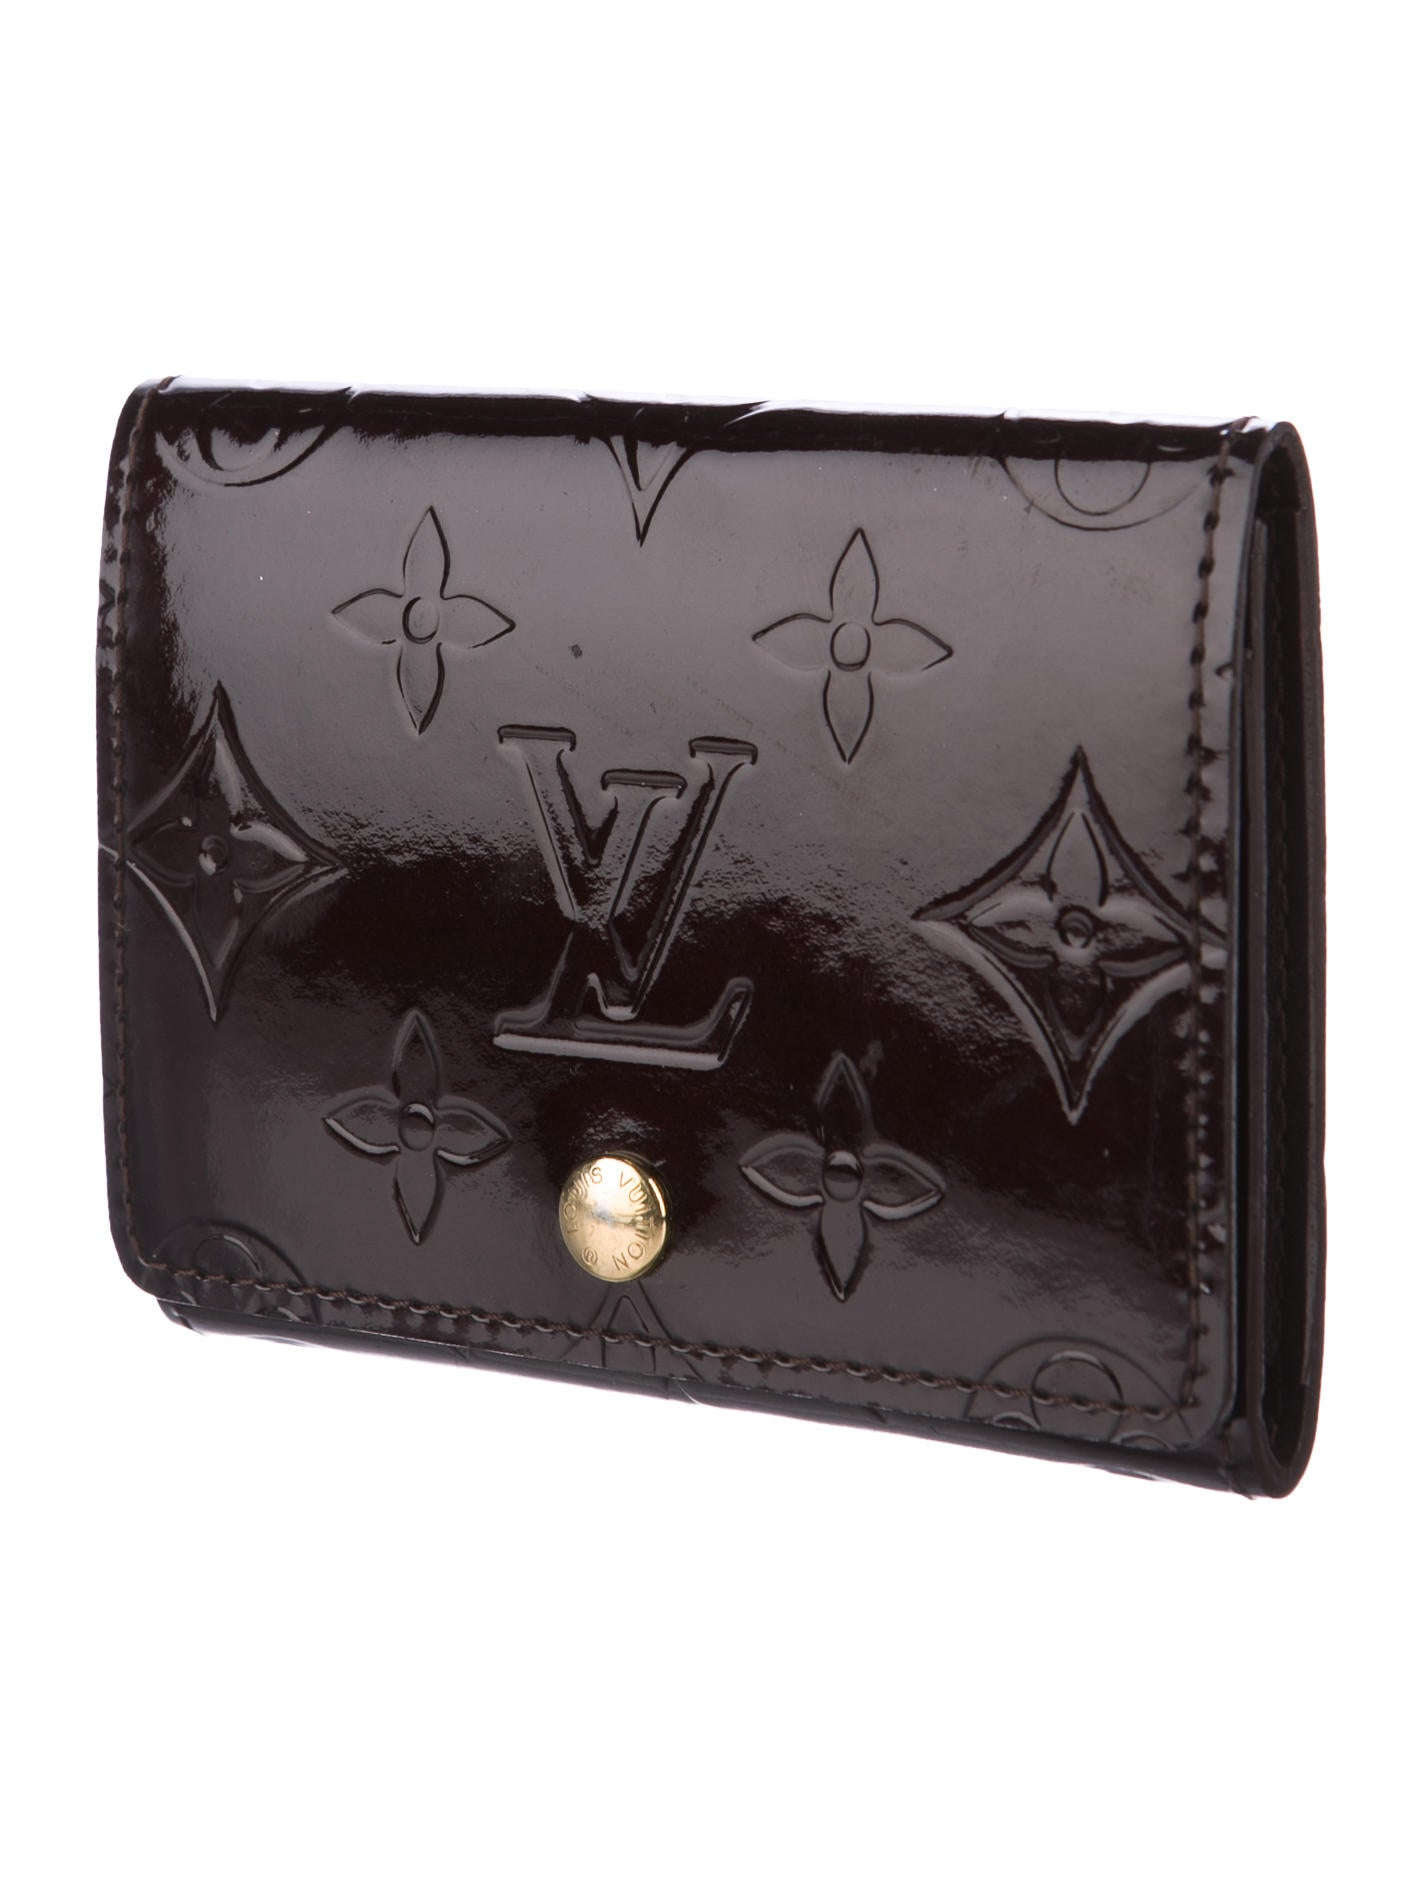 Louis Vuitton Vernis Business Card Holder - Accessories ...